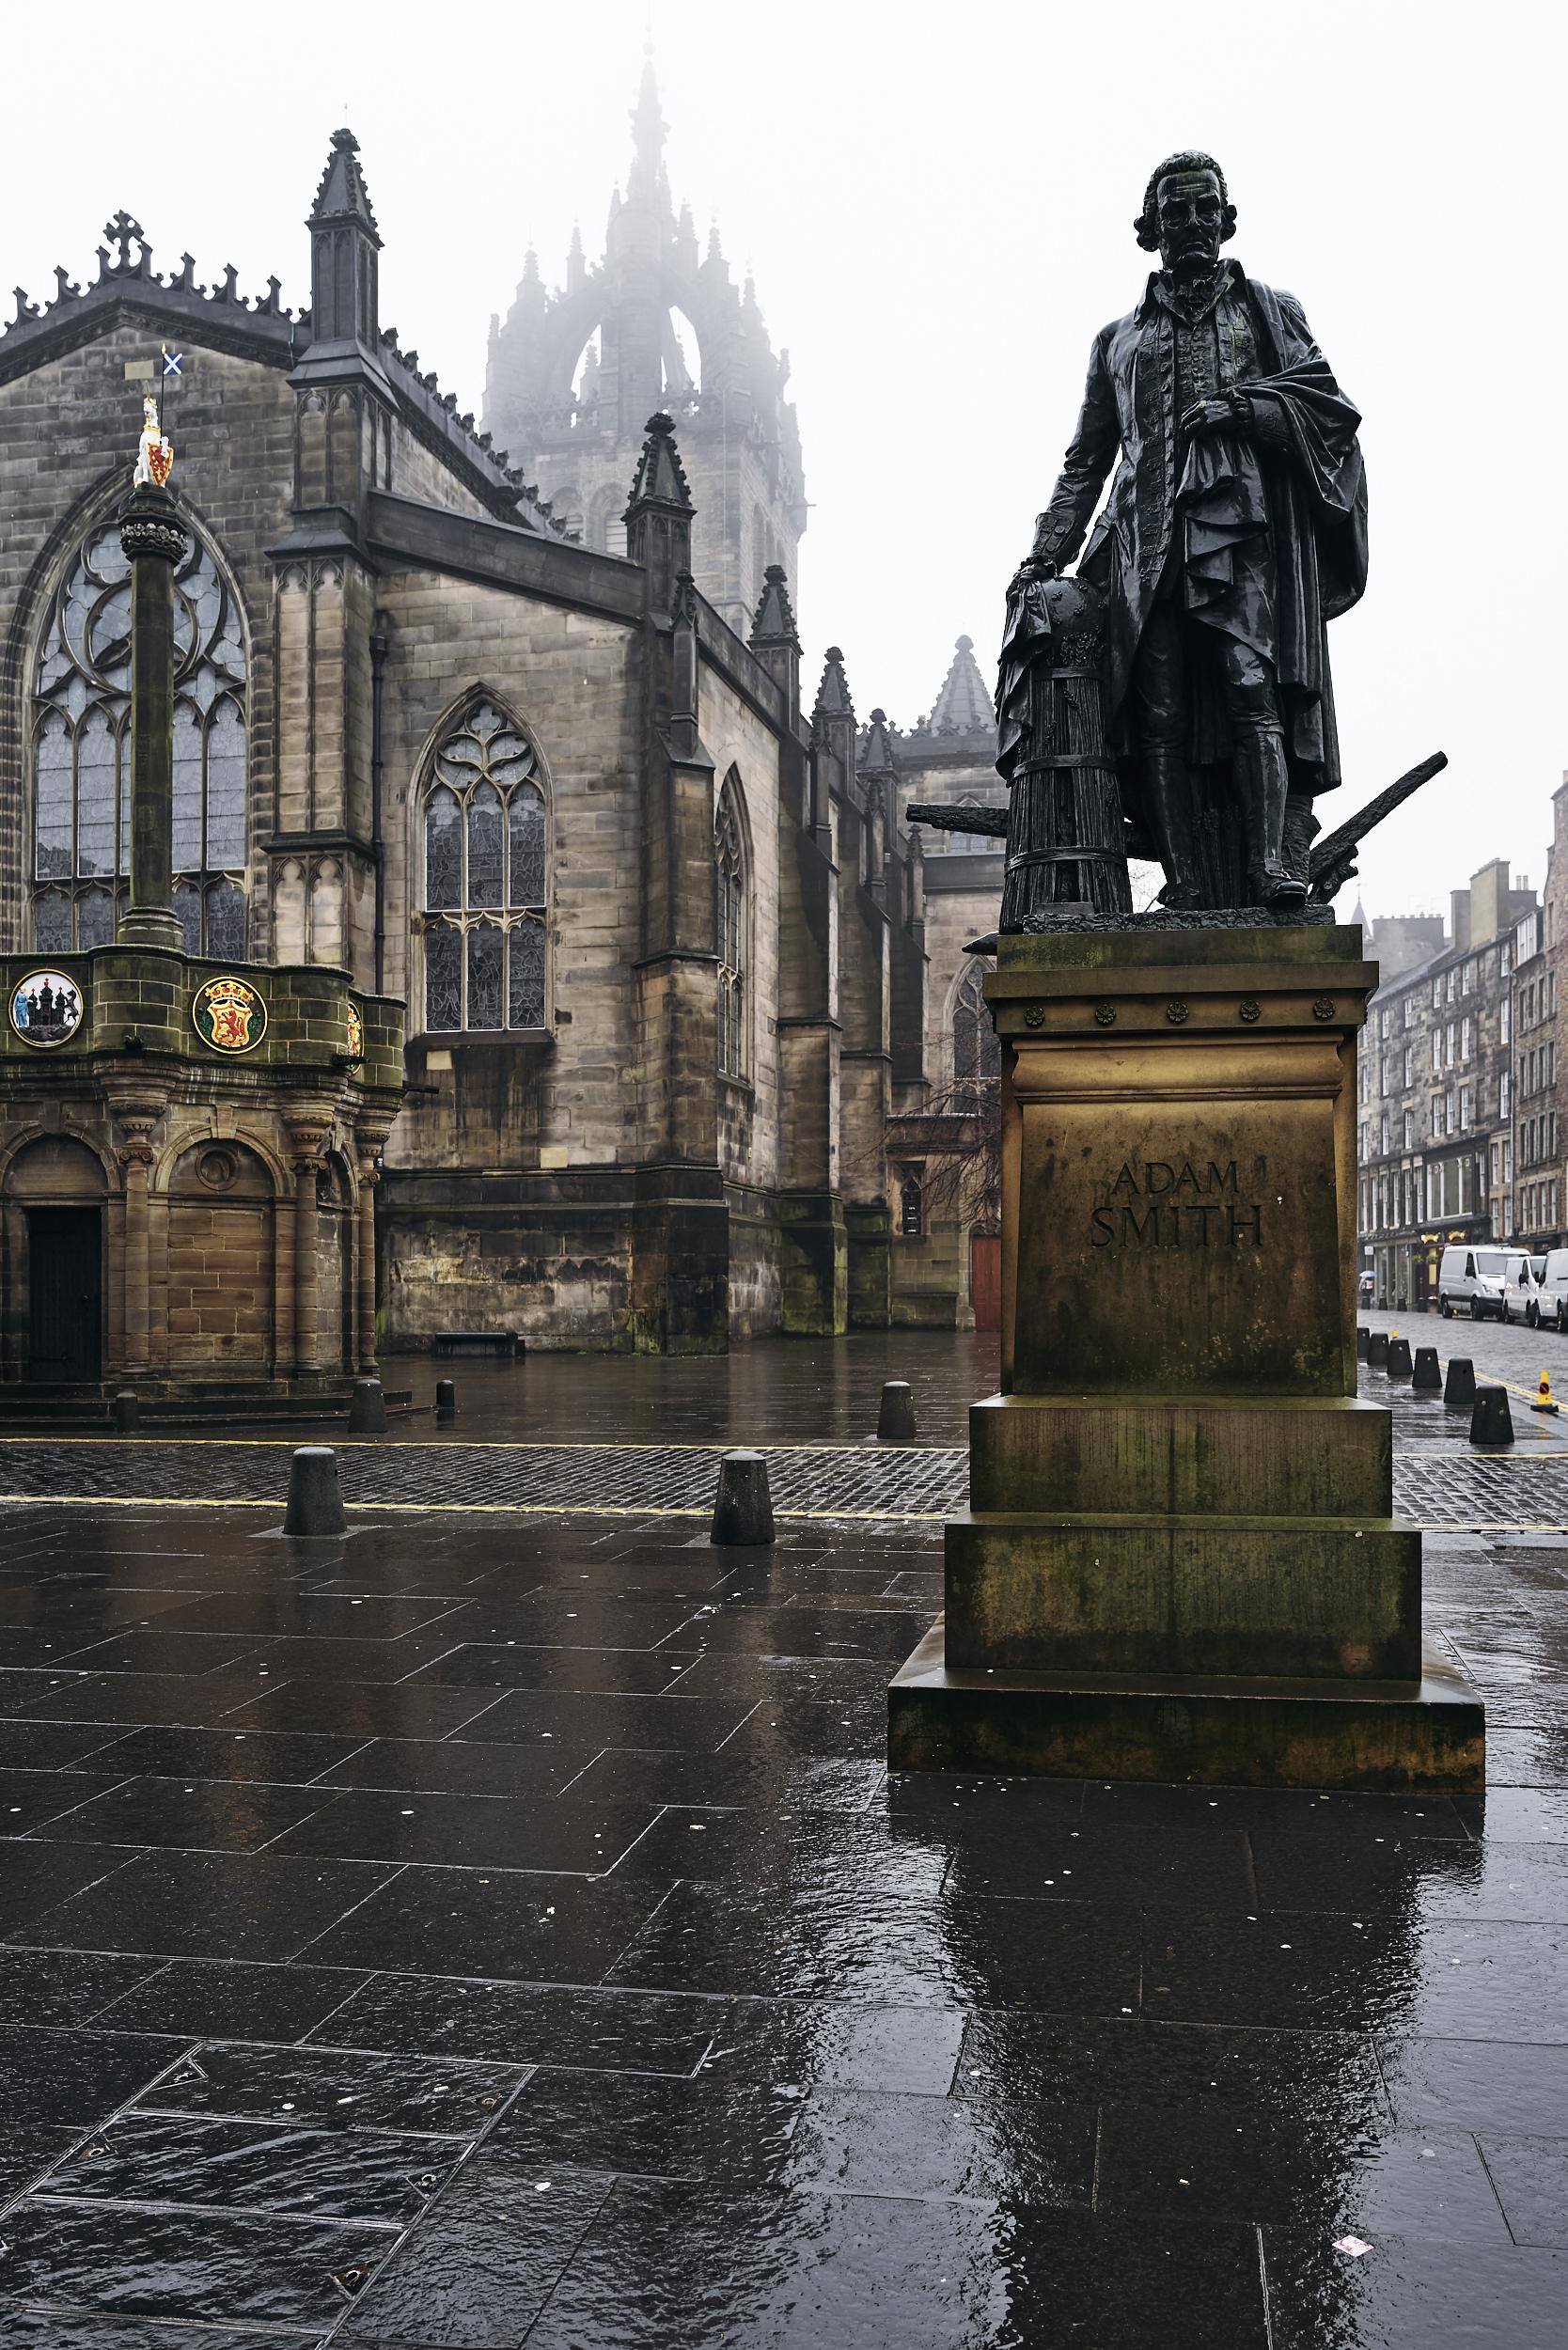 2019 04 14 - Scotland 2019 Q2 15.jpg